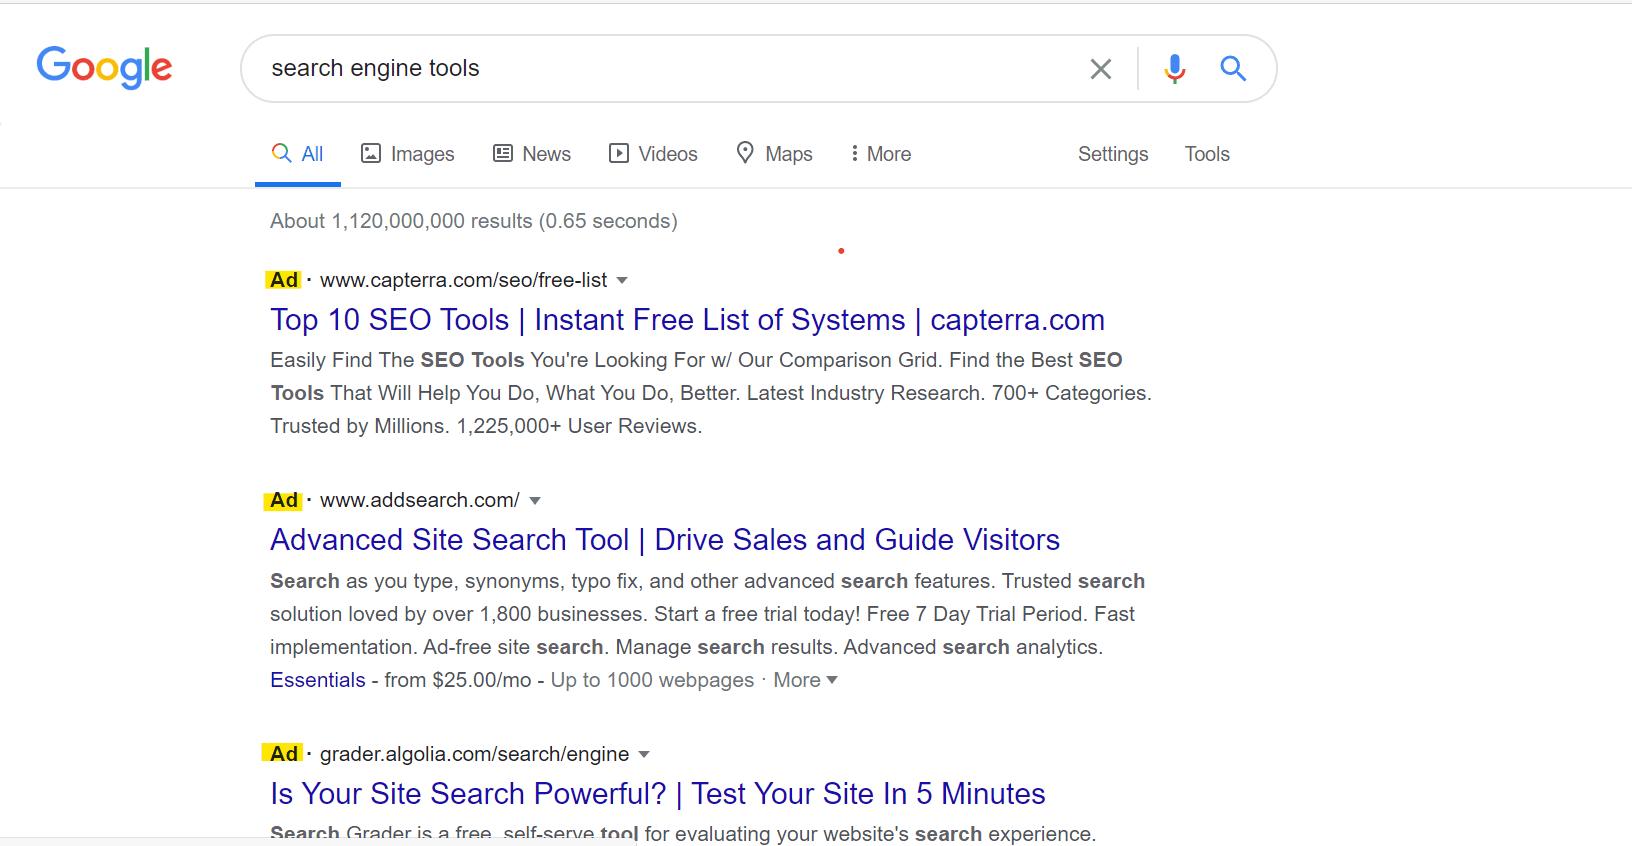 google-ad-grants-for-nonprofits-search